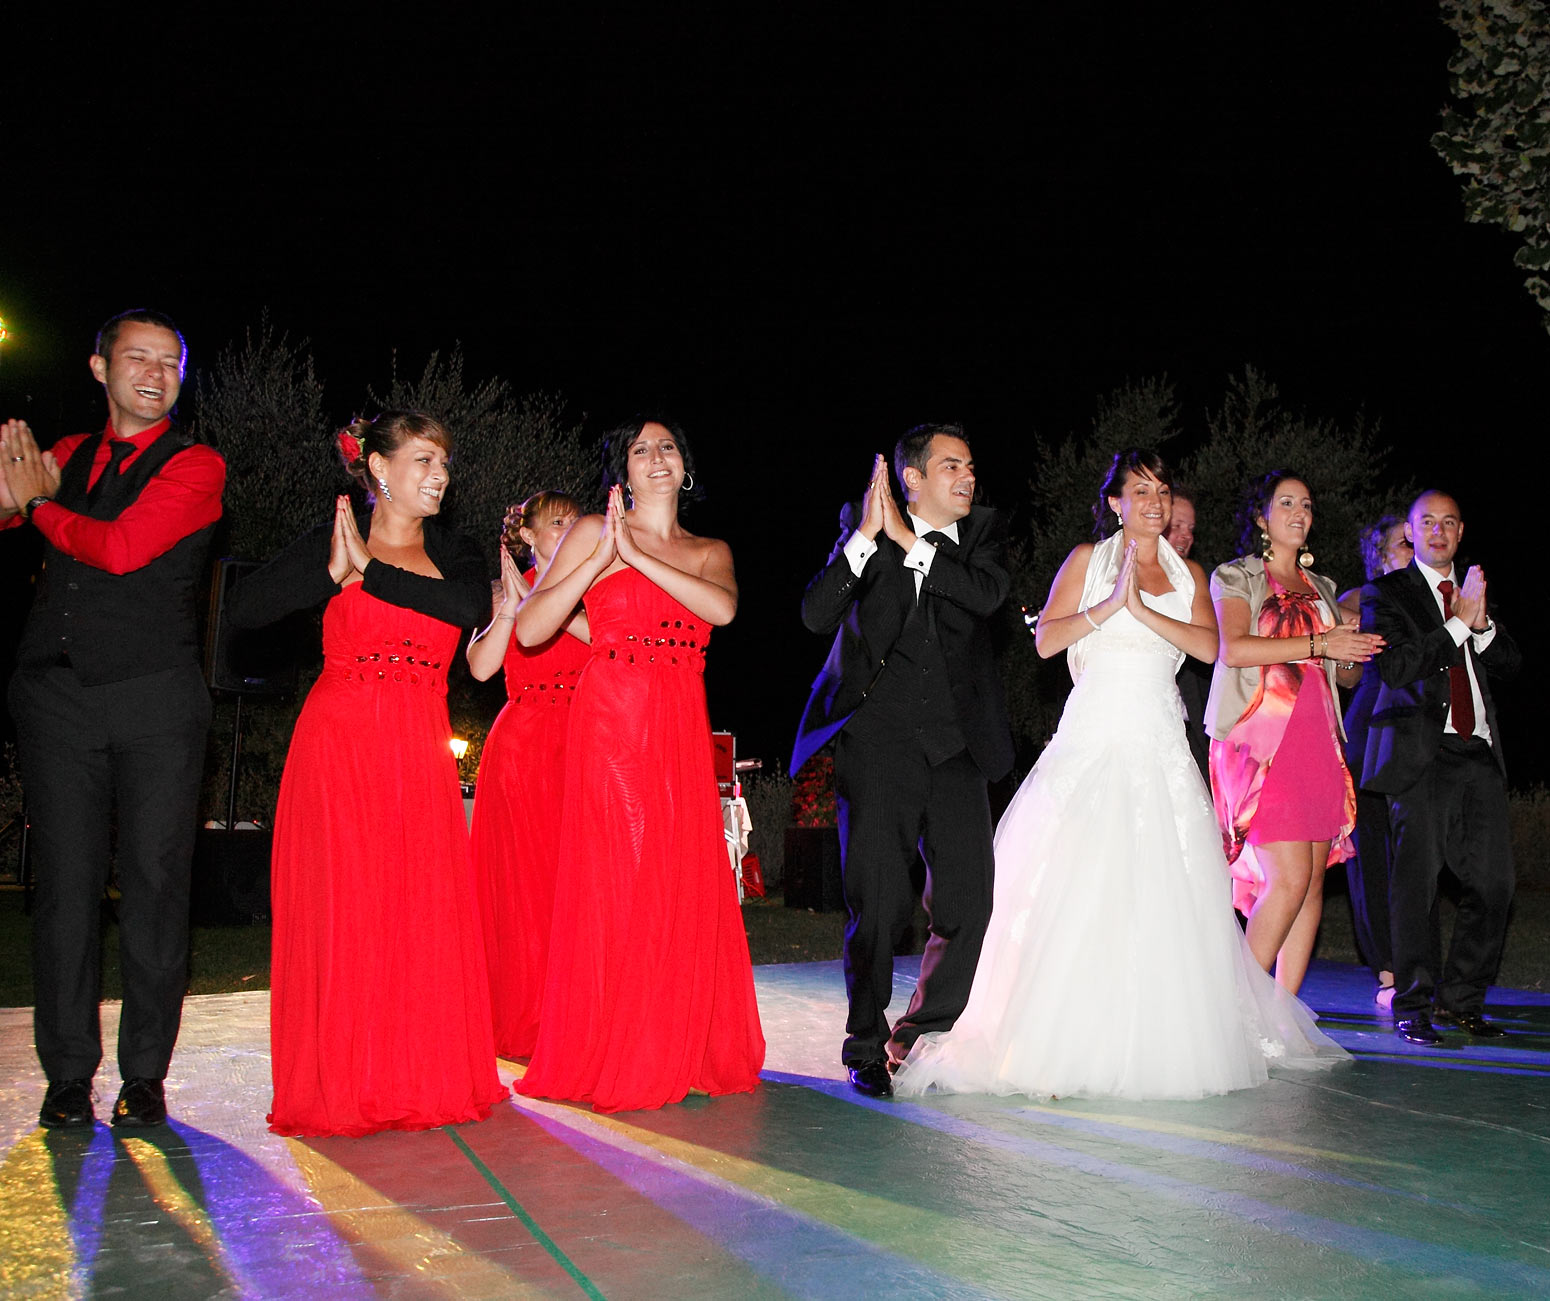 Musica Matrimonio Toscana : Borgo tre rose musica per nozze toscana animazione matrimonio